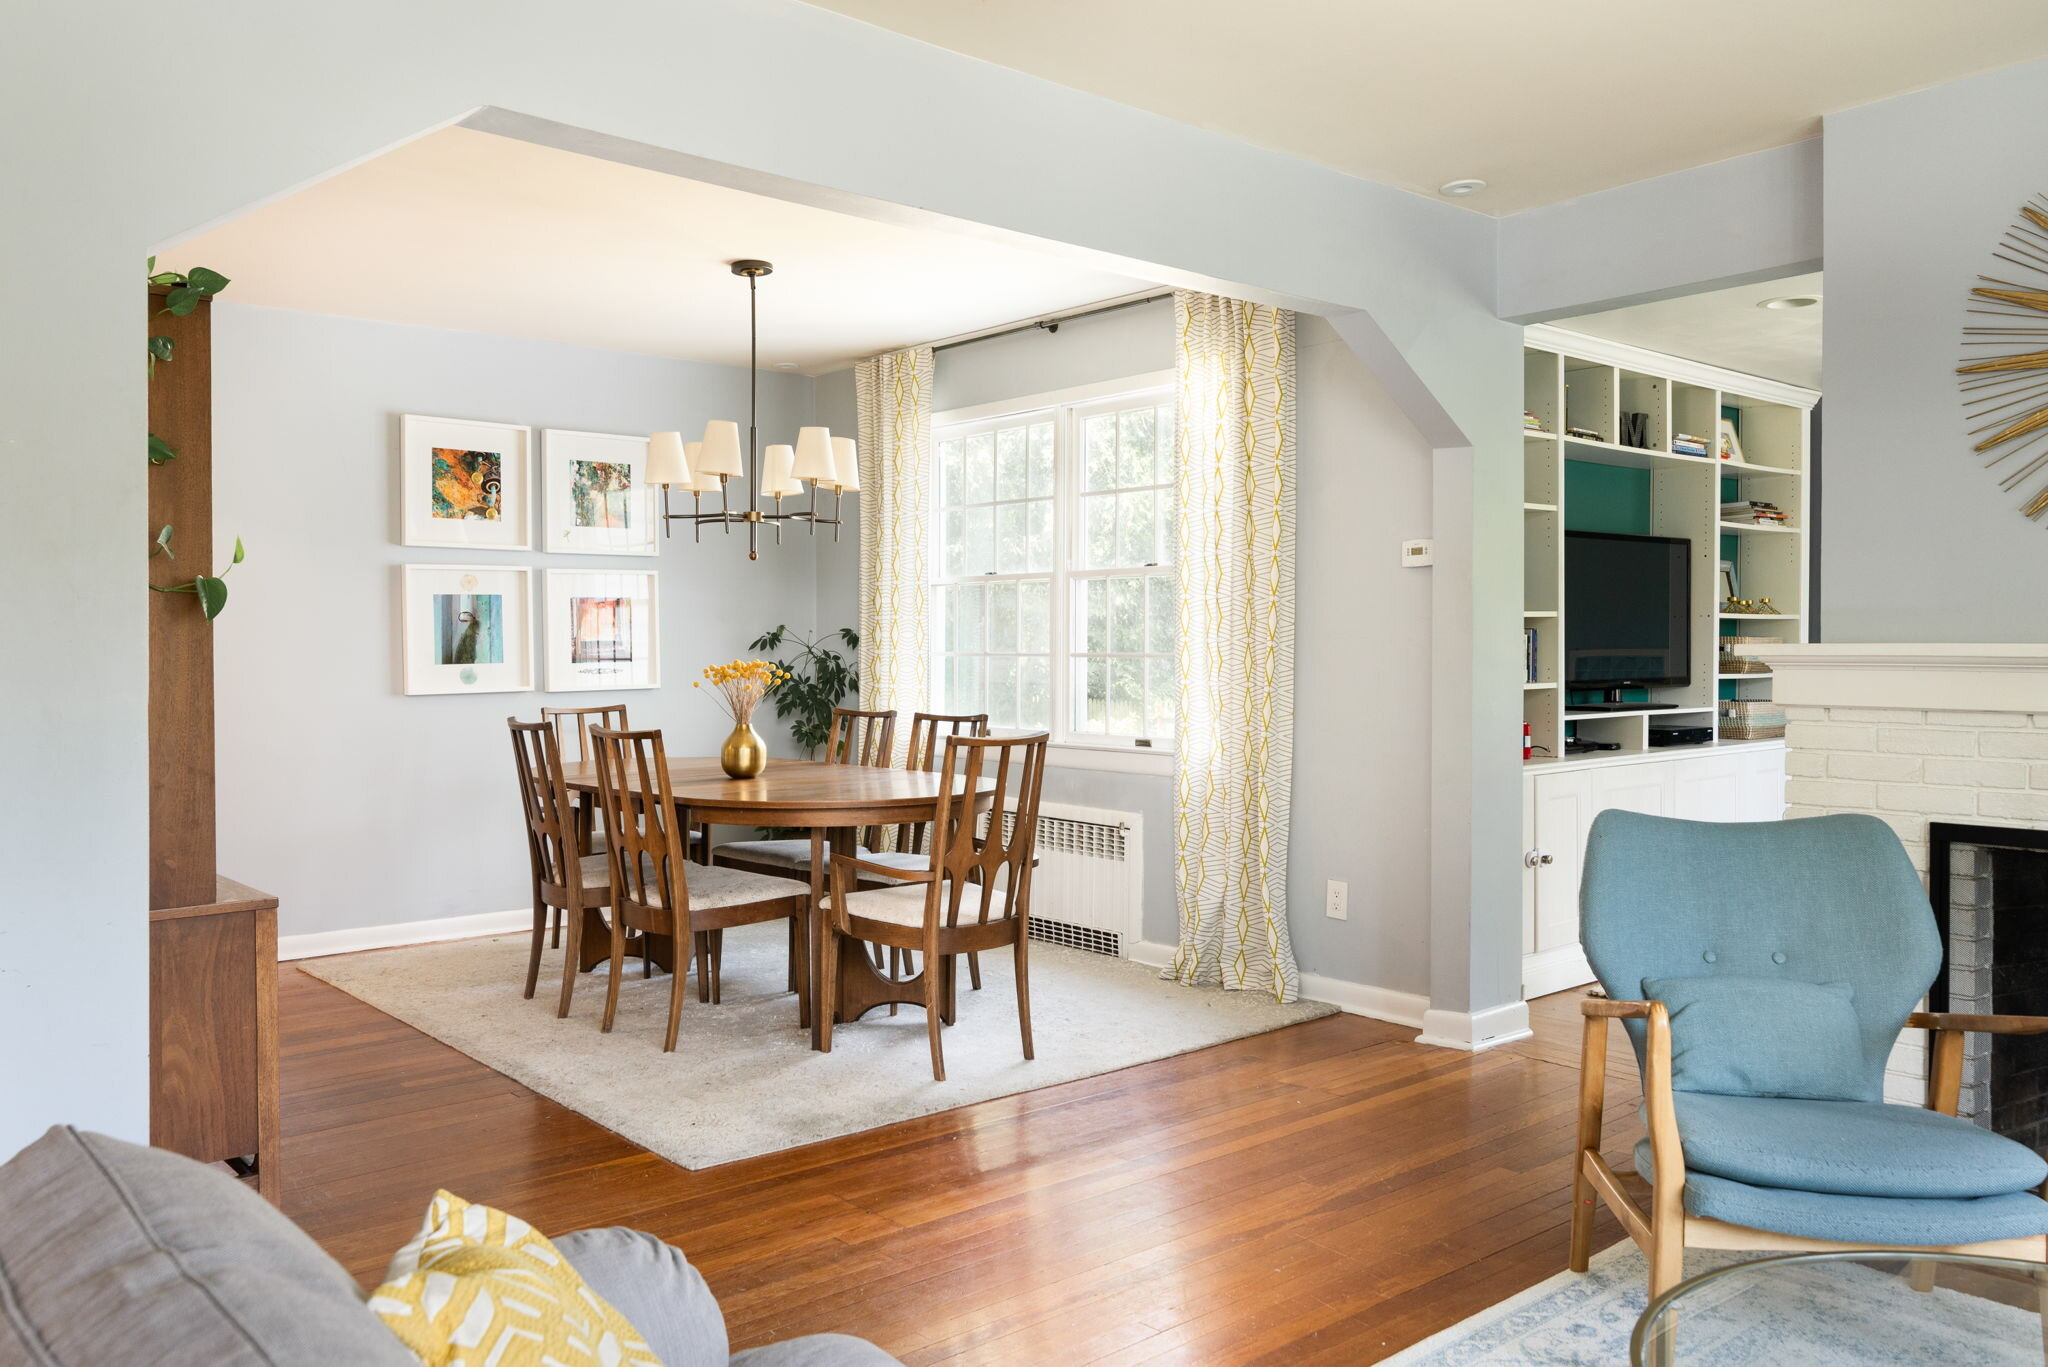 Interior lights off - this home had fantastic natural light.